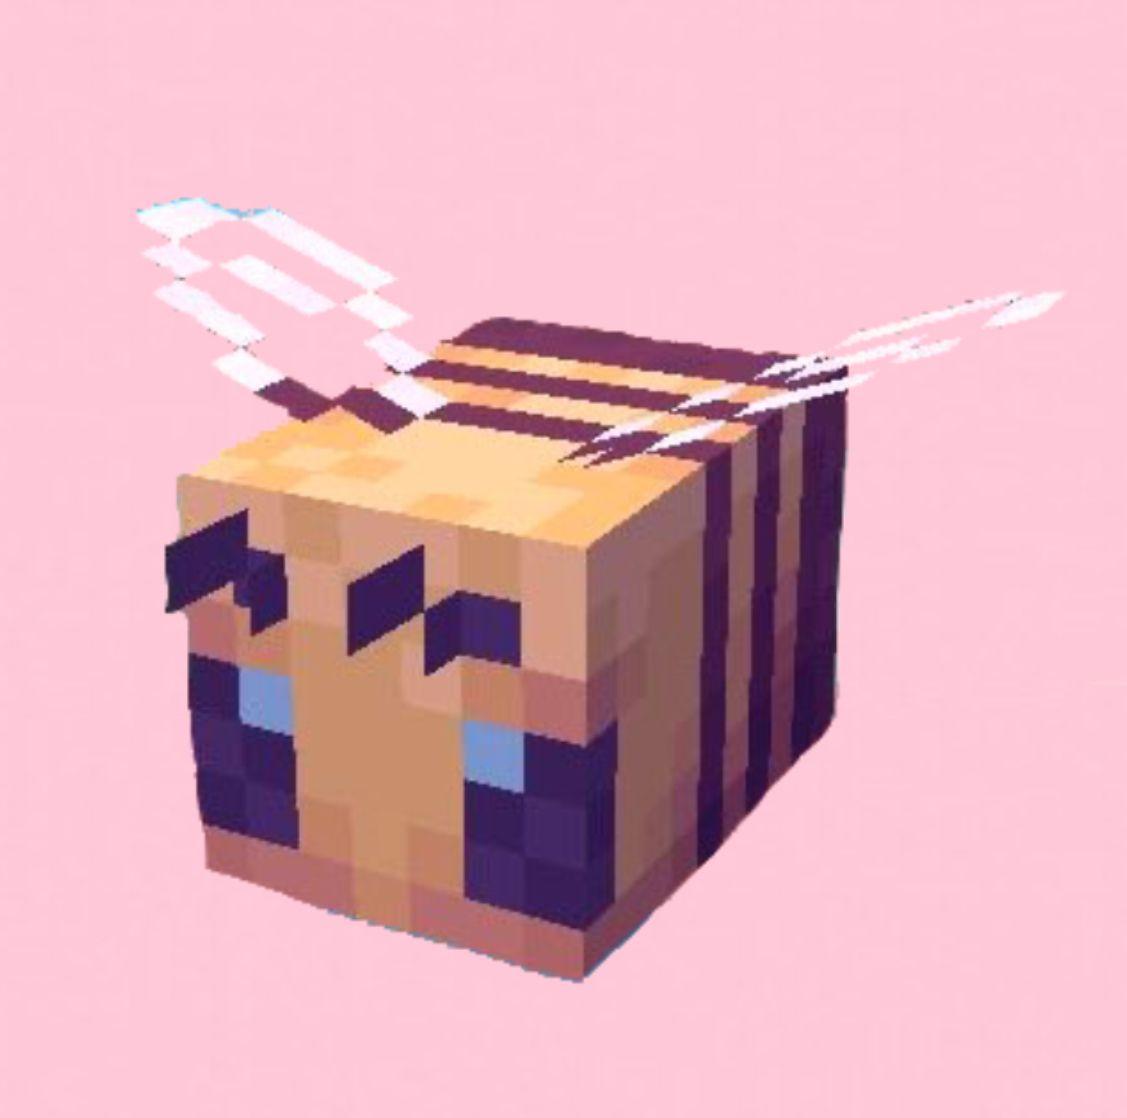 Minecraft Icon Minecraft Wallpaper Kawaii App Minecraft App